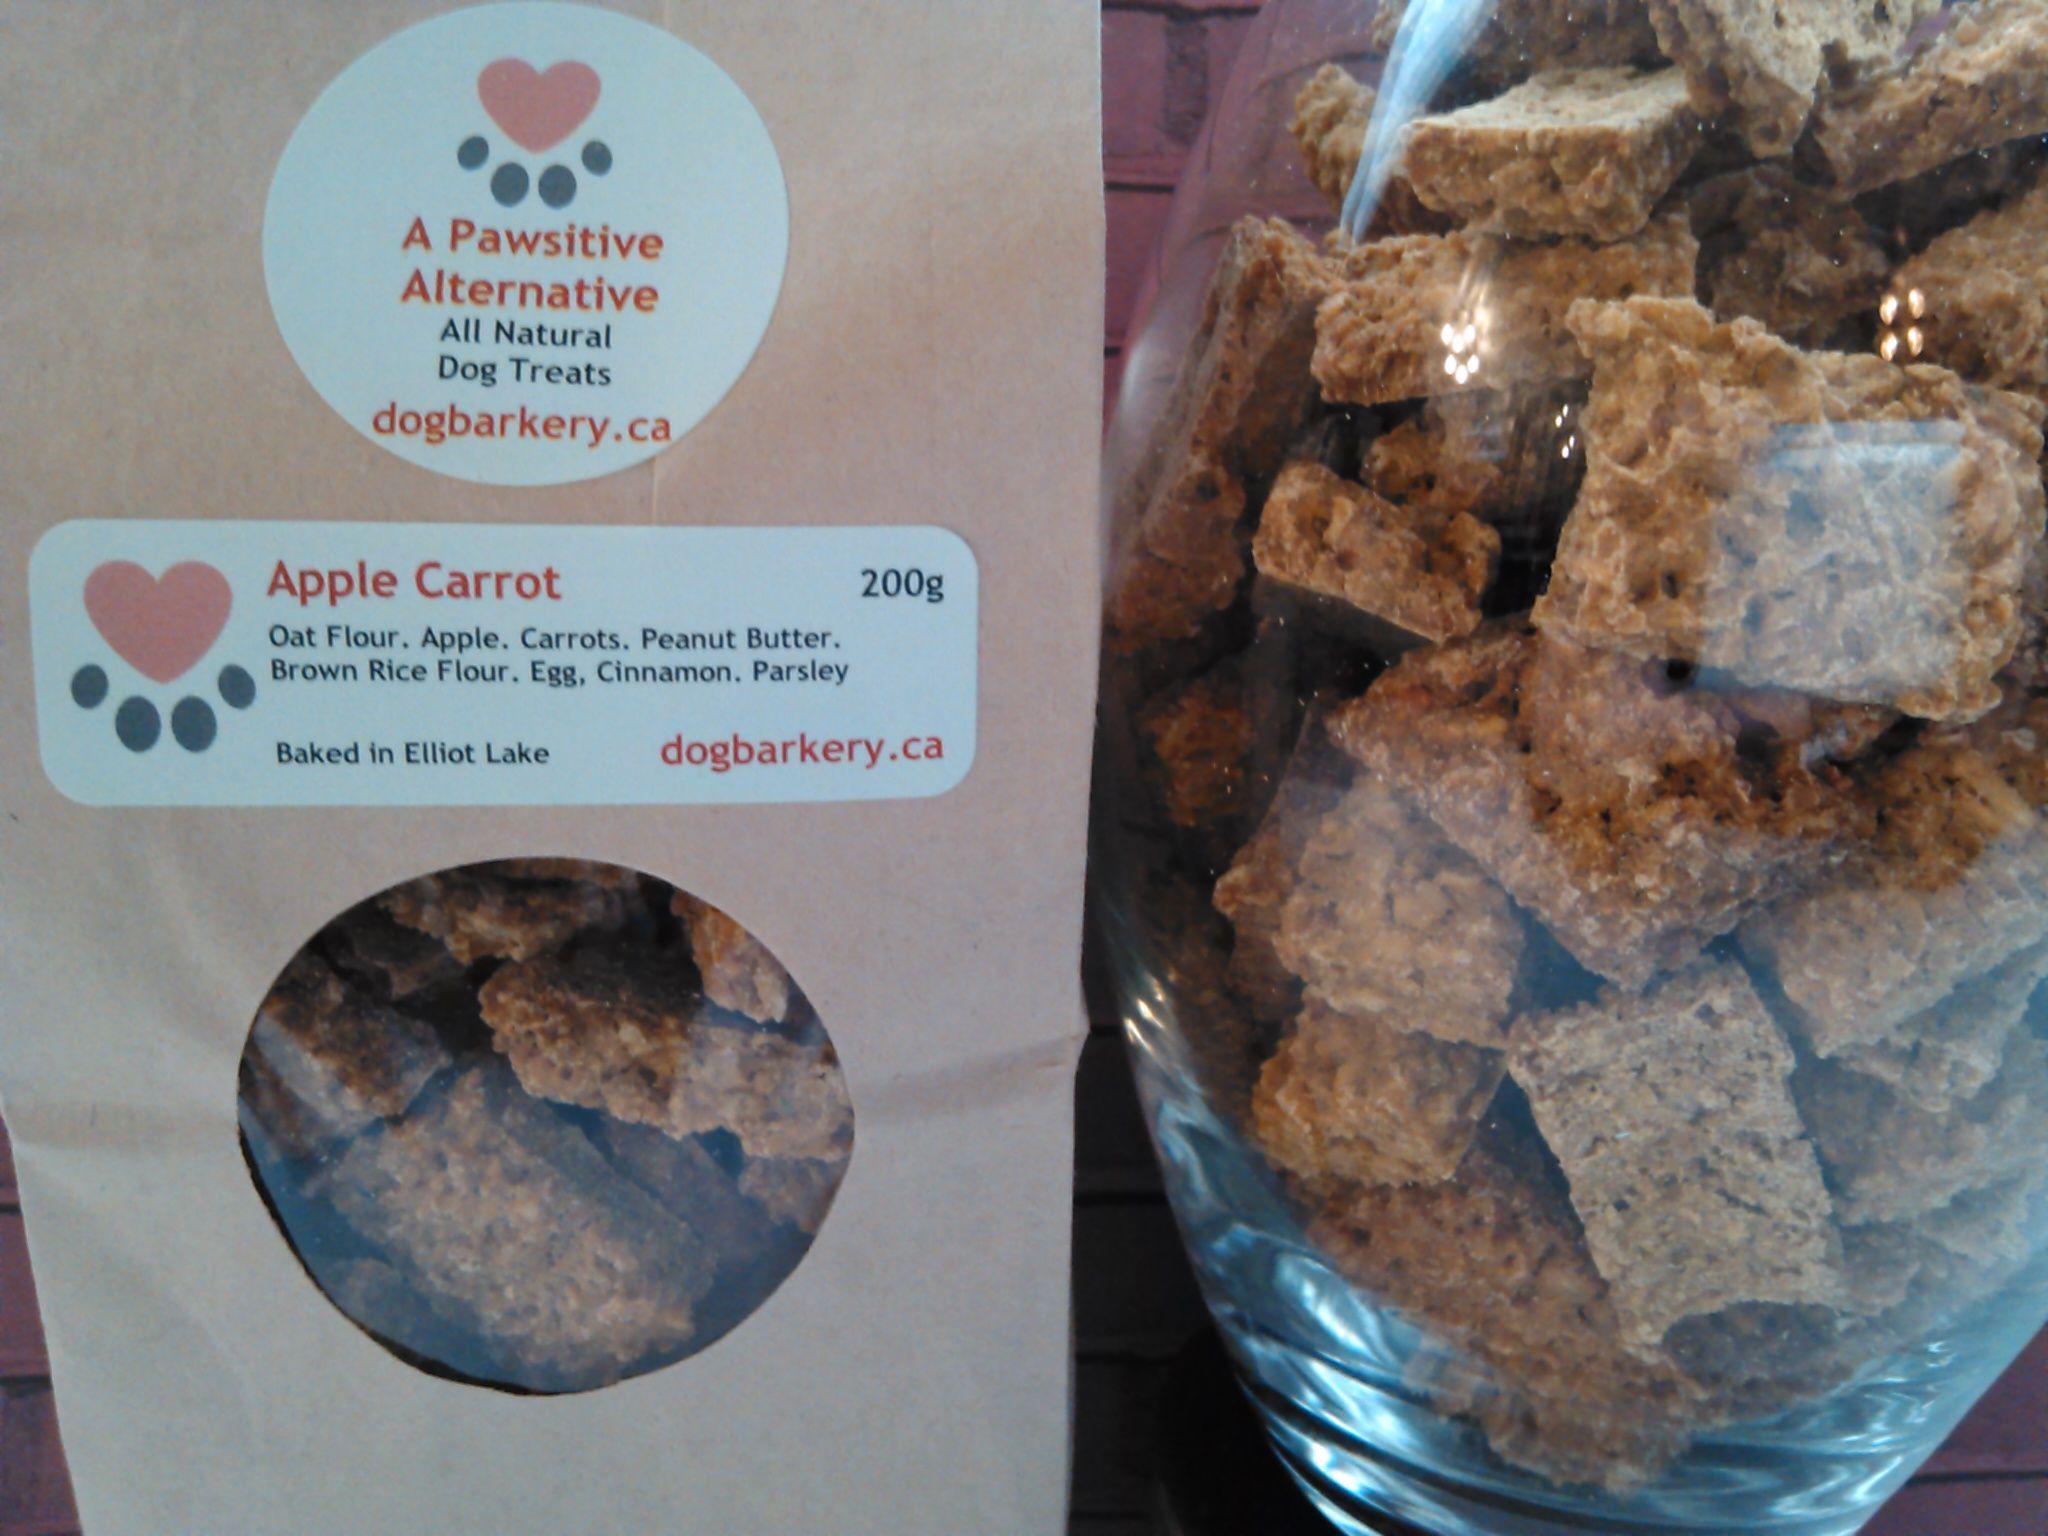 Apple carrot dog treat oat flour apples carrots peanut